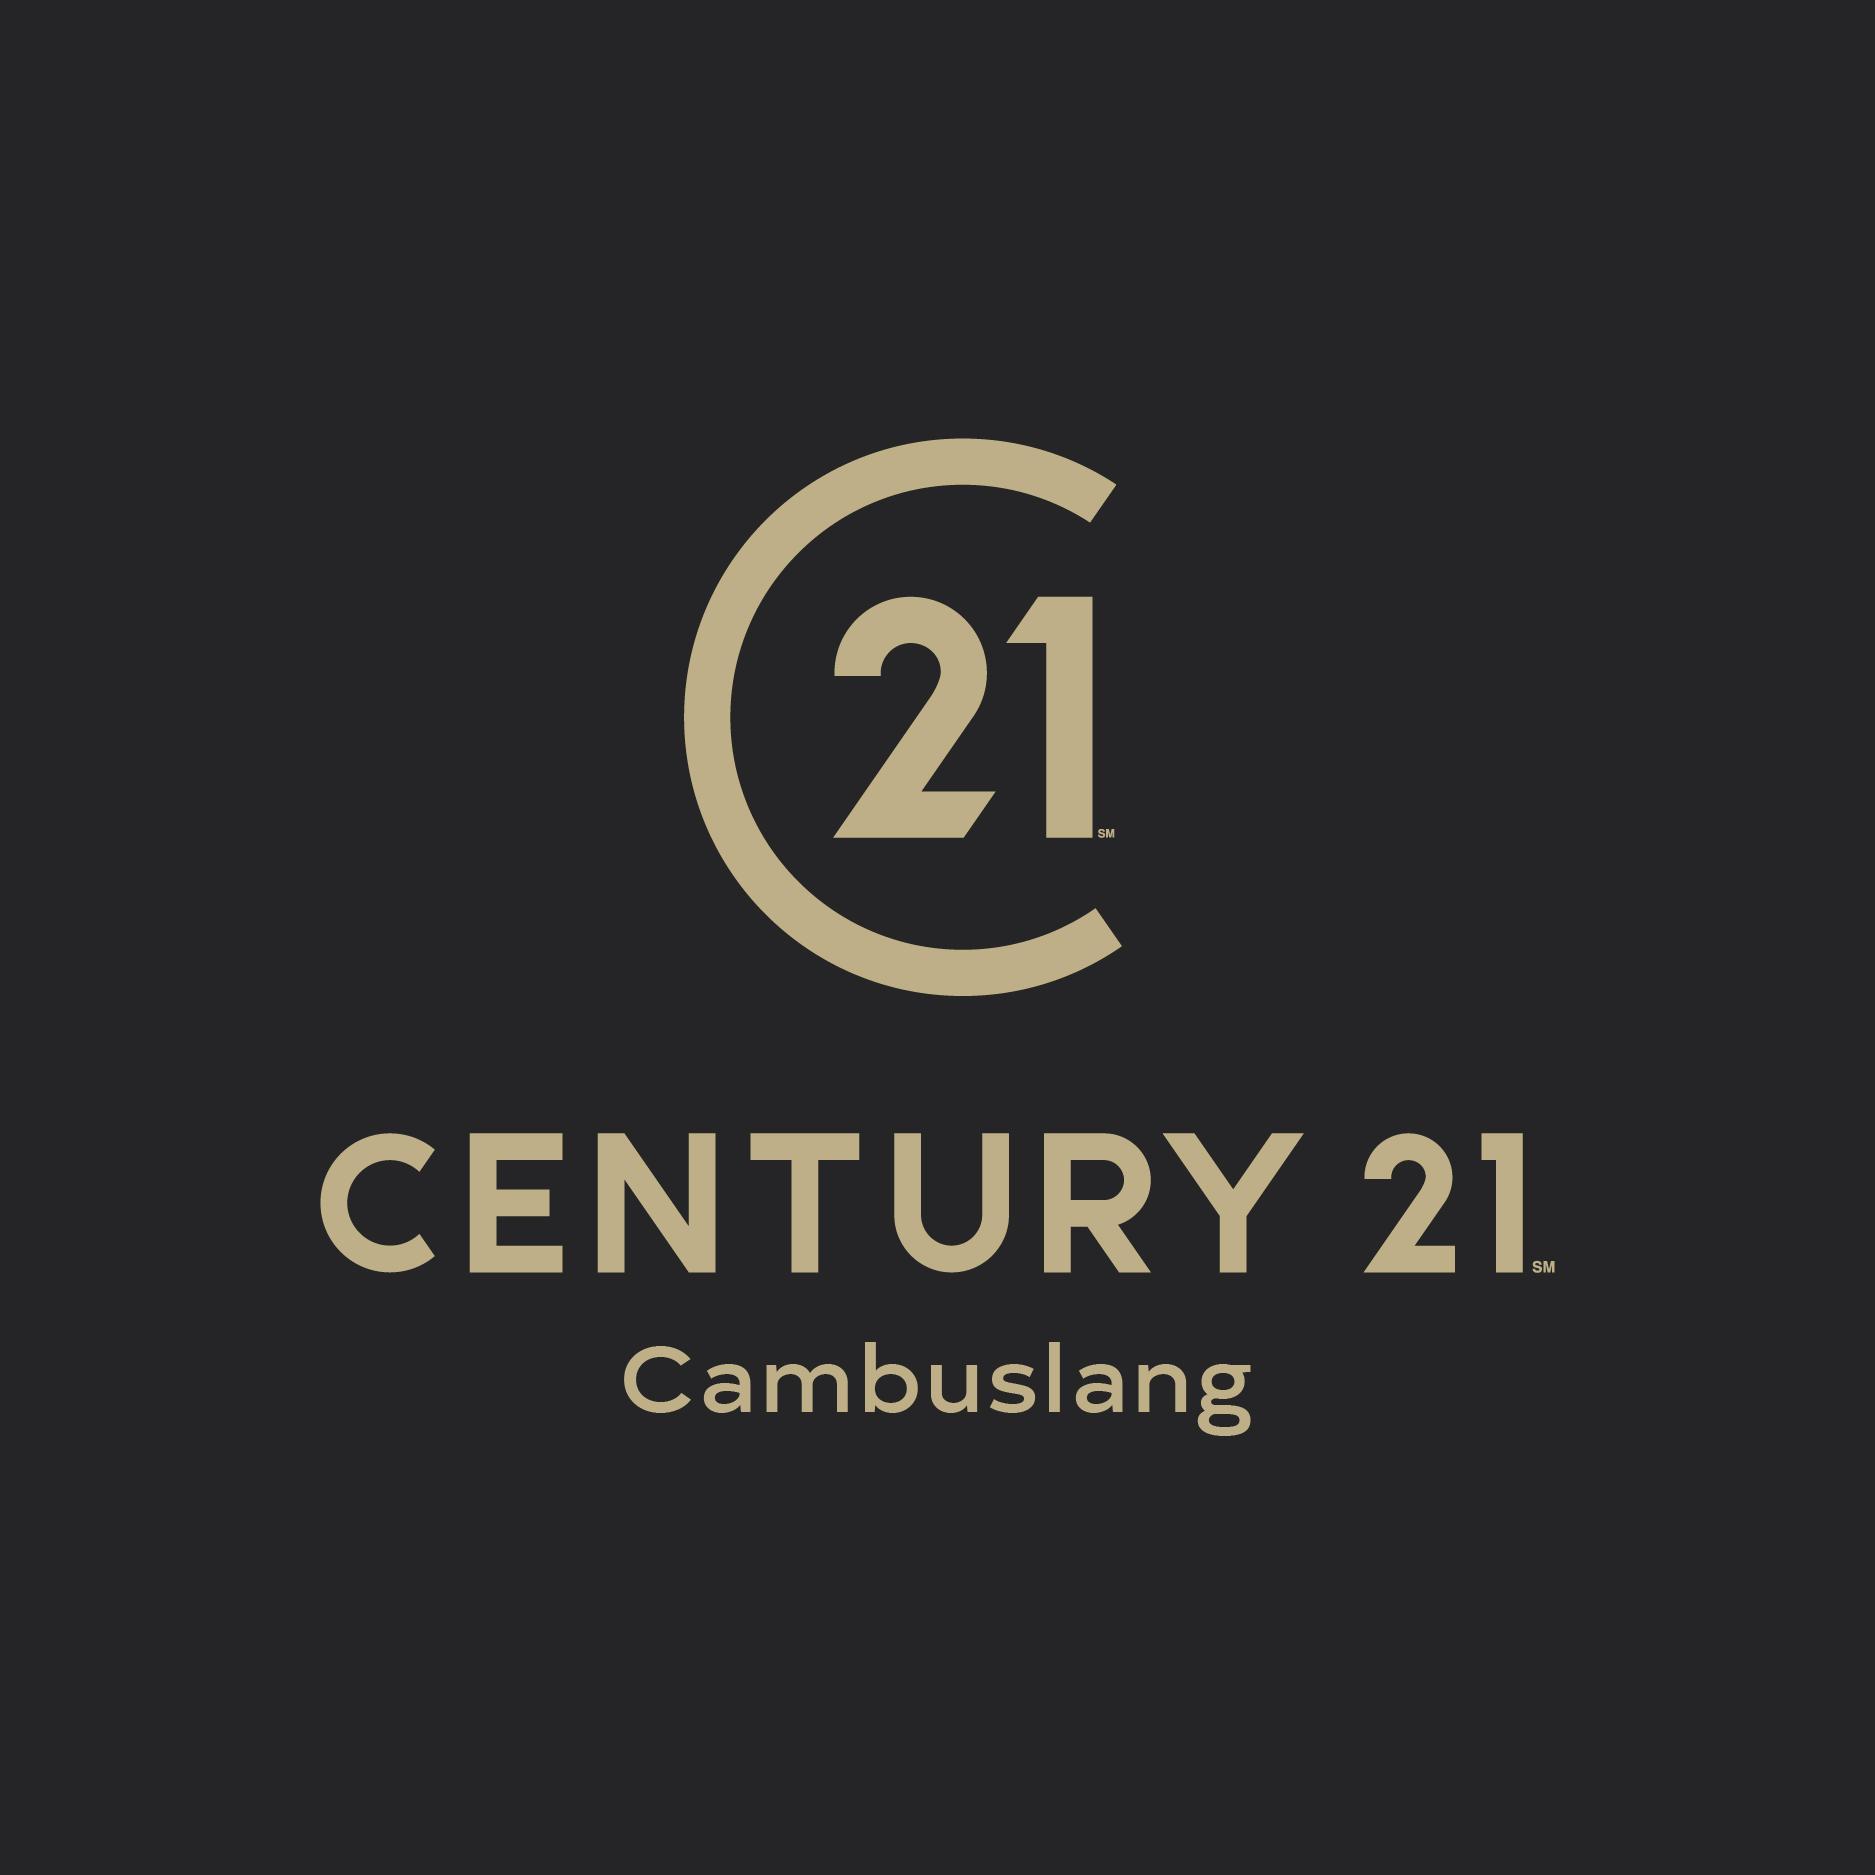 Century 21 - Cambuslang